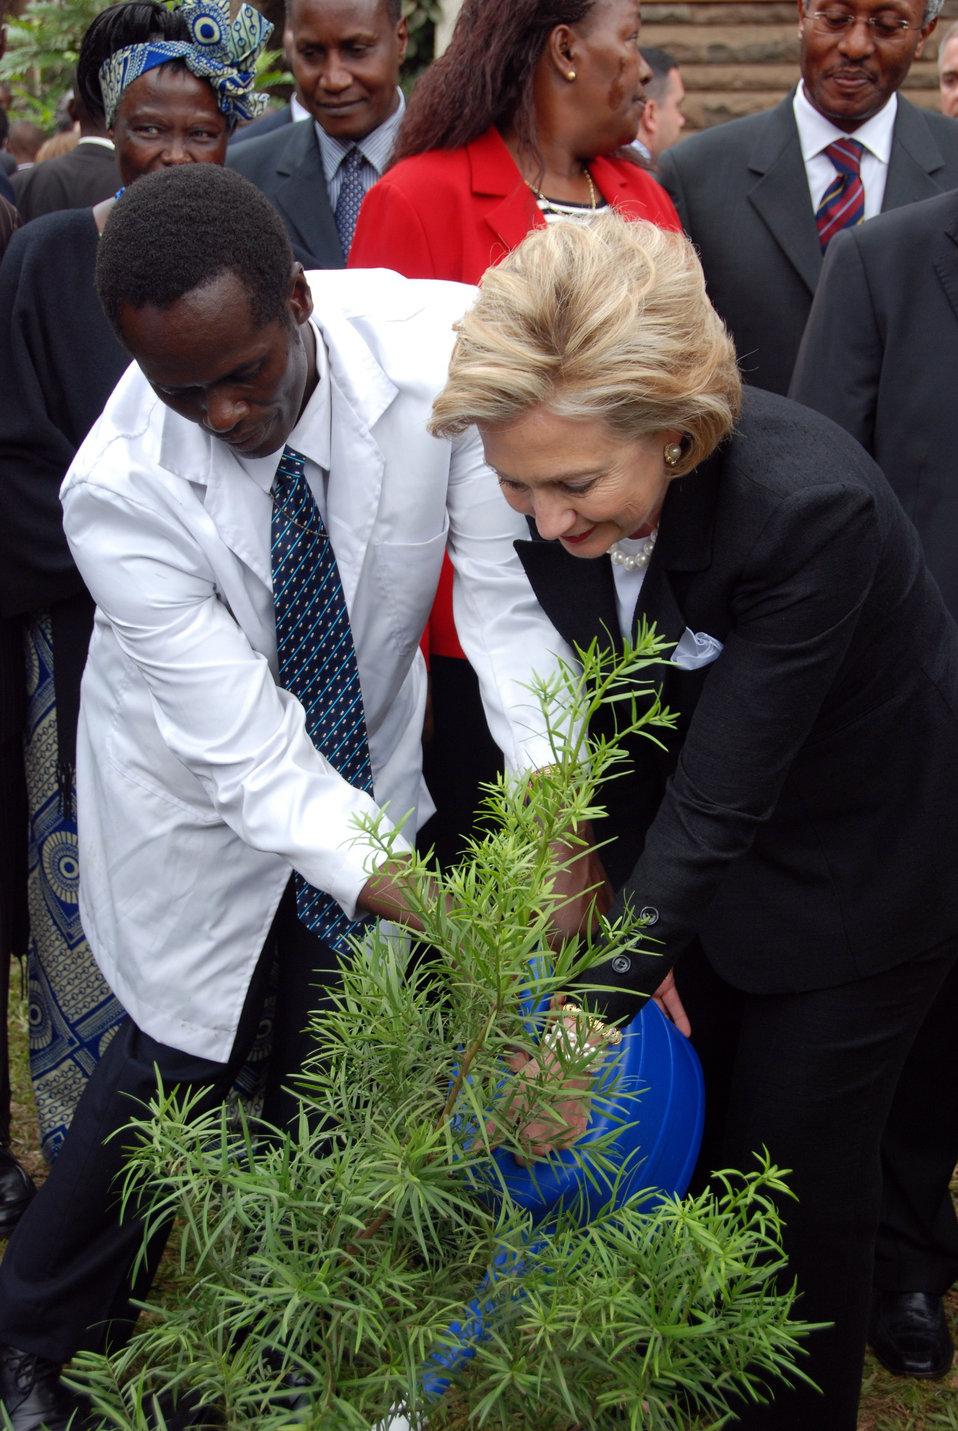 Secretary Clinton Ceremonial Tree Planting